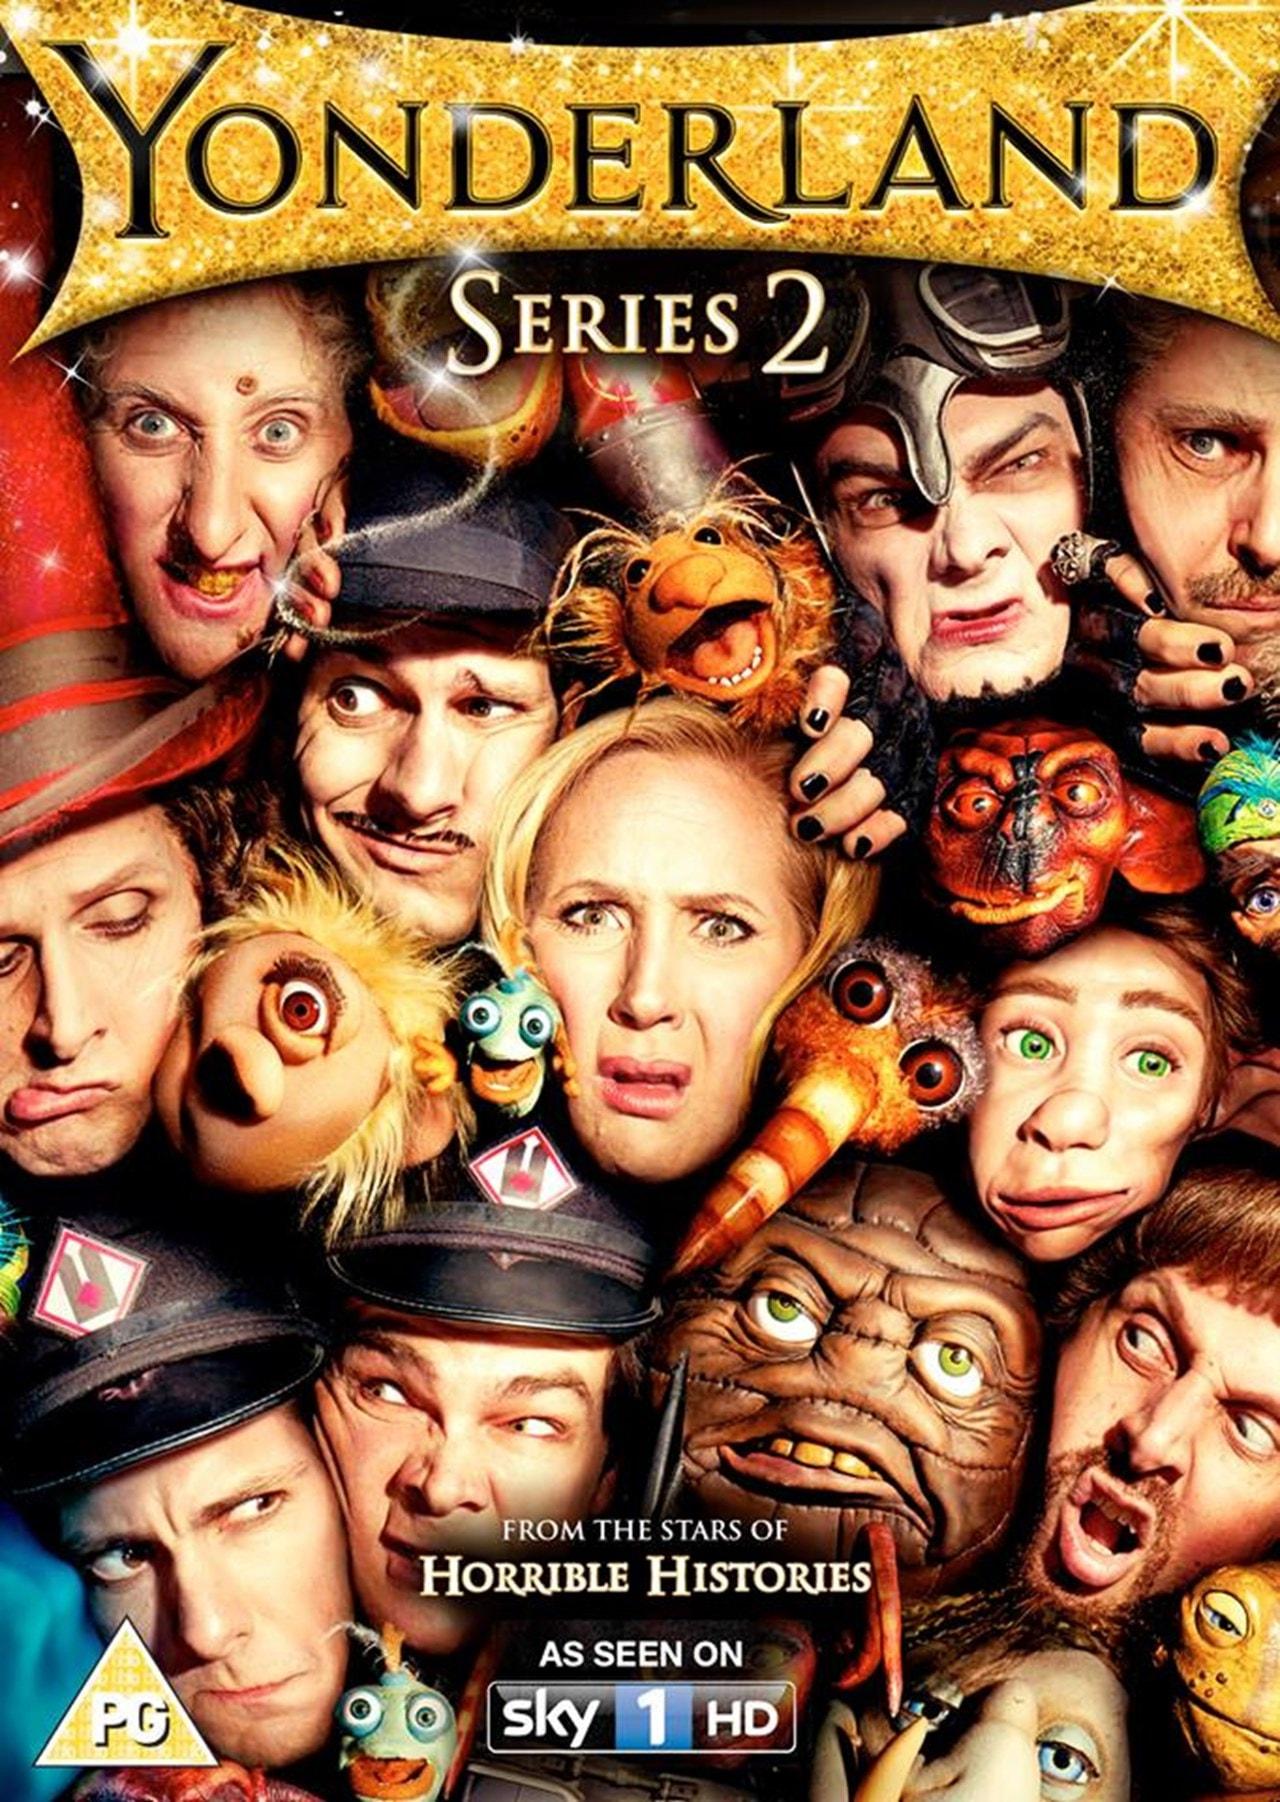 Yonderland: Series 2 - 1